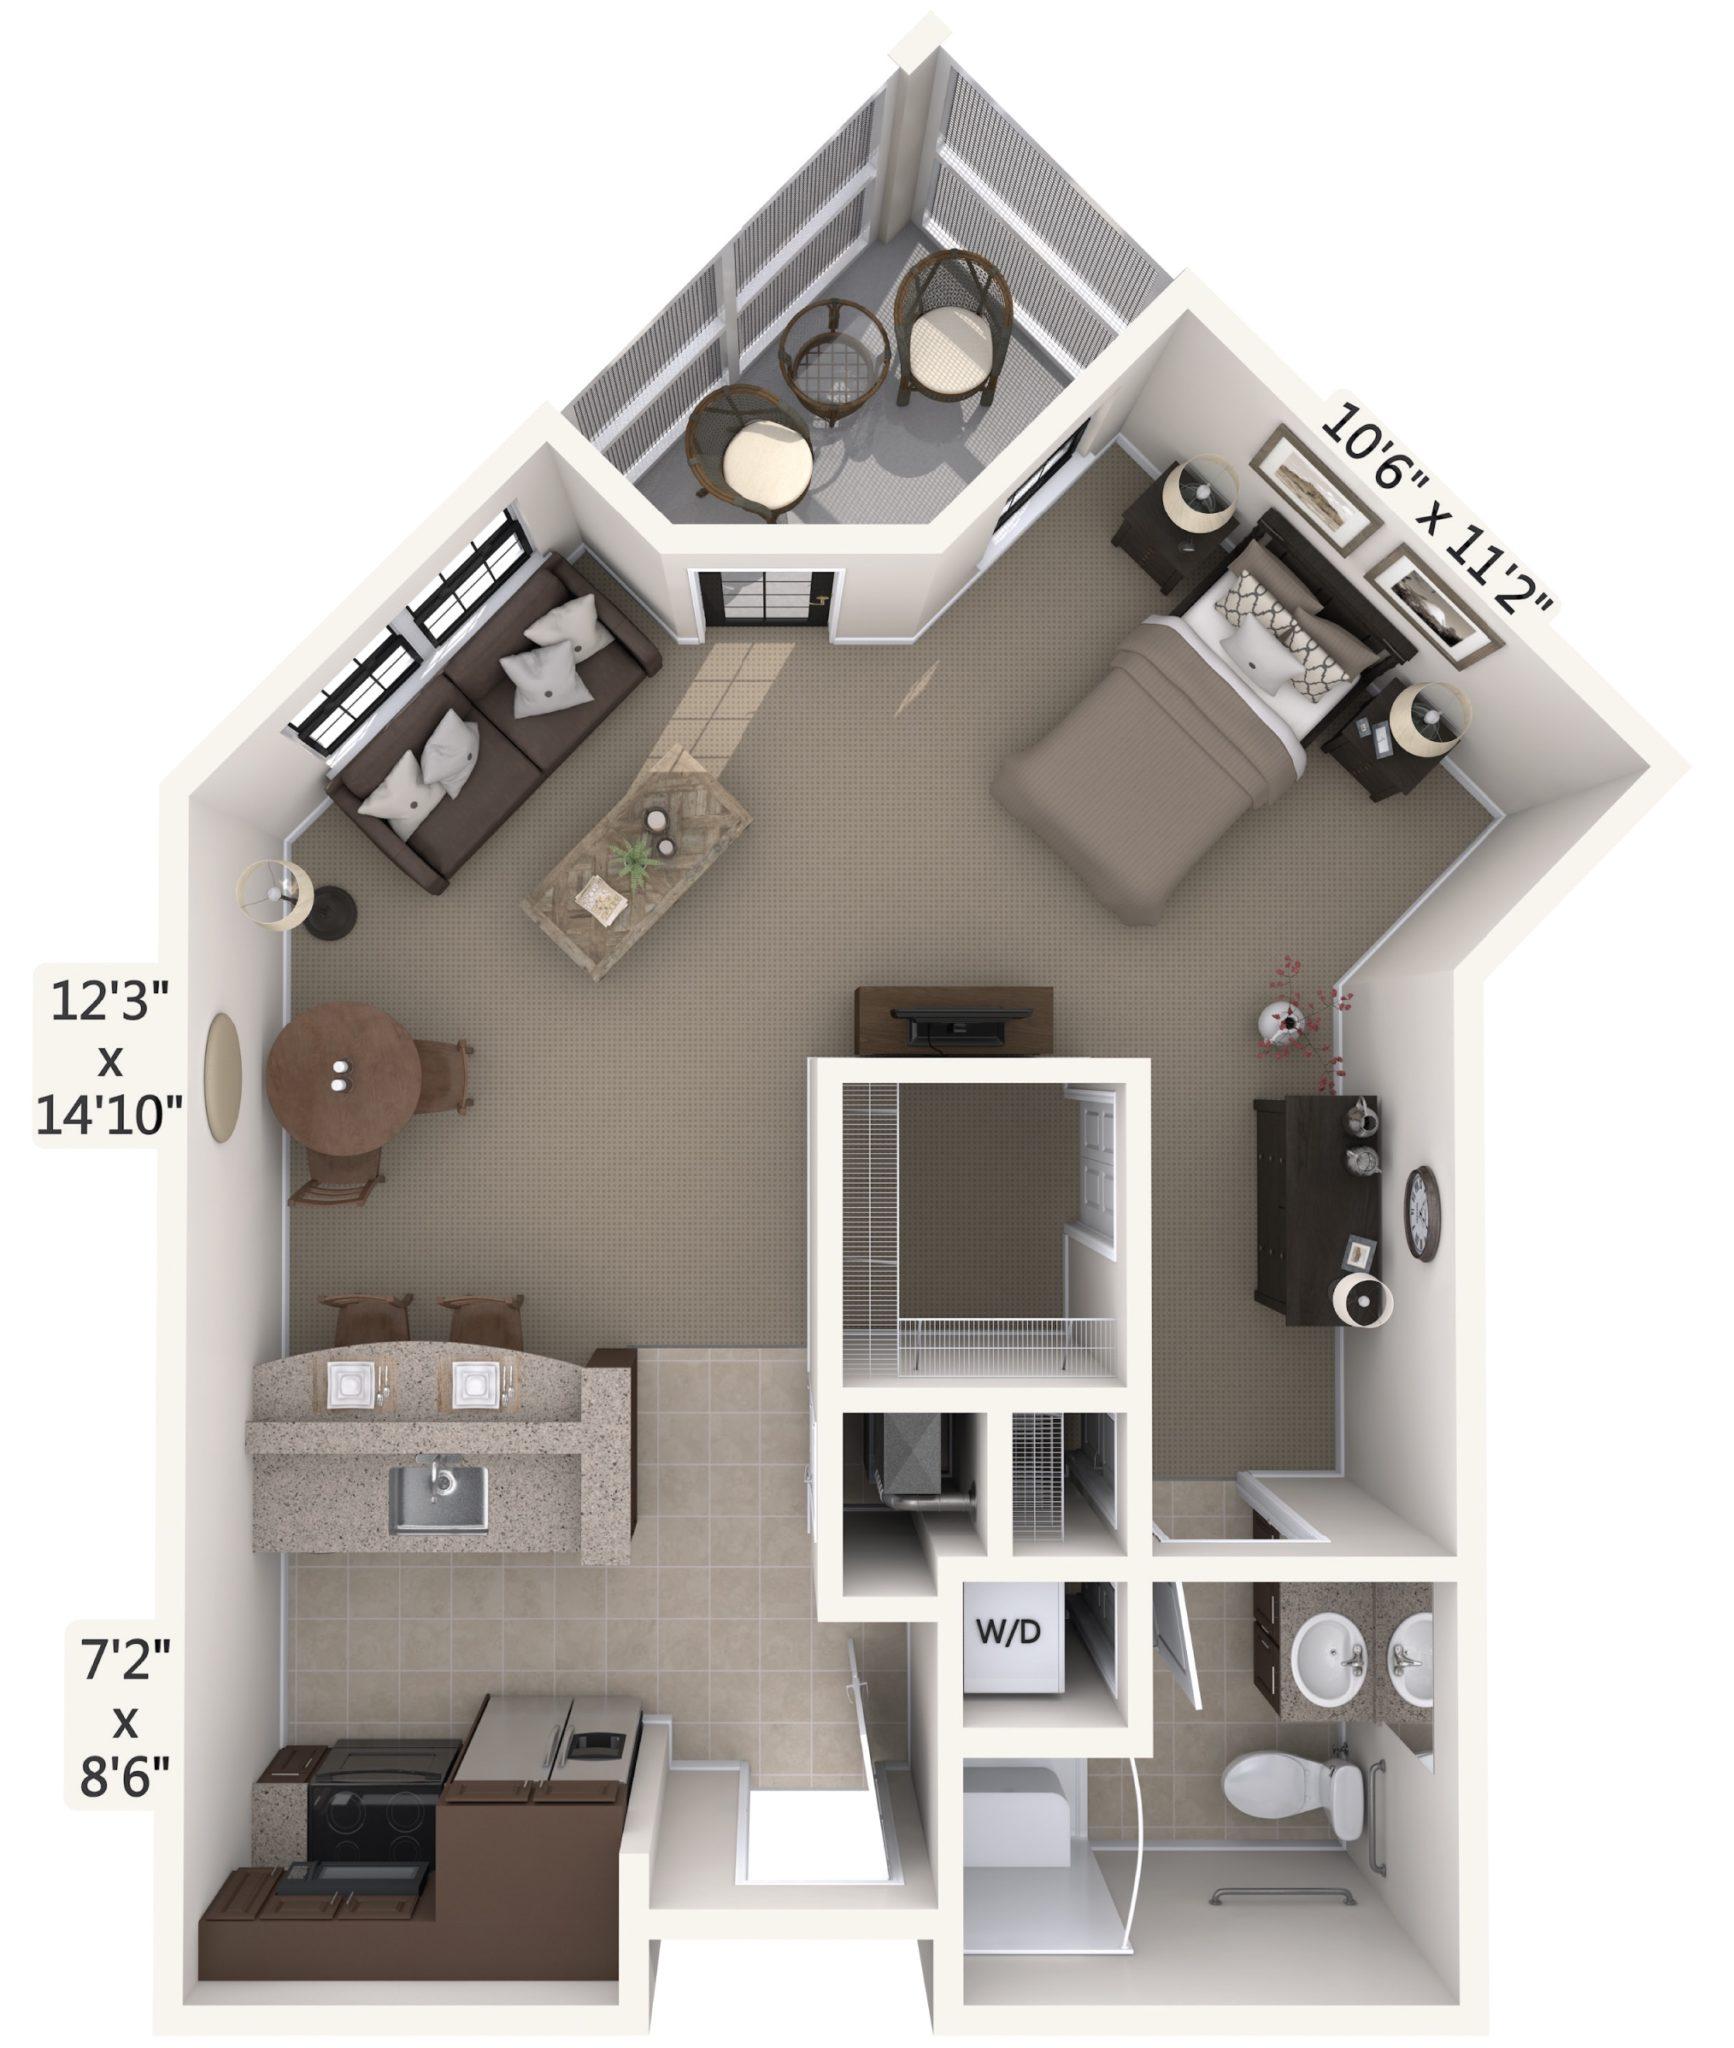 AddingtonPlace_Studio-Prelude_607-sq.-ft._AL_Jupiter-1734x2048